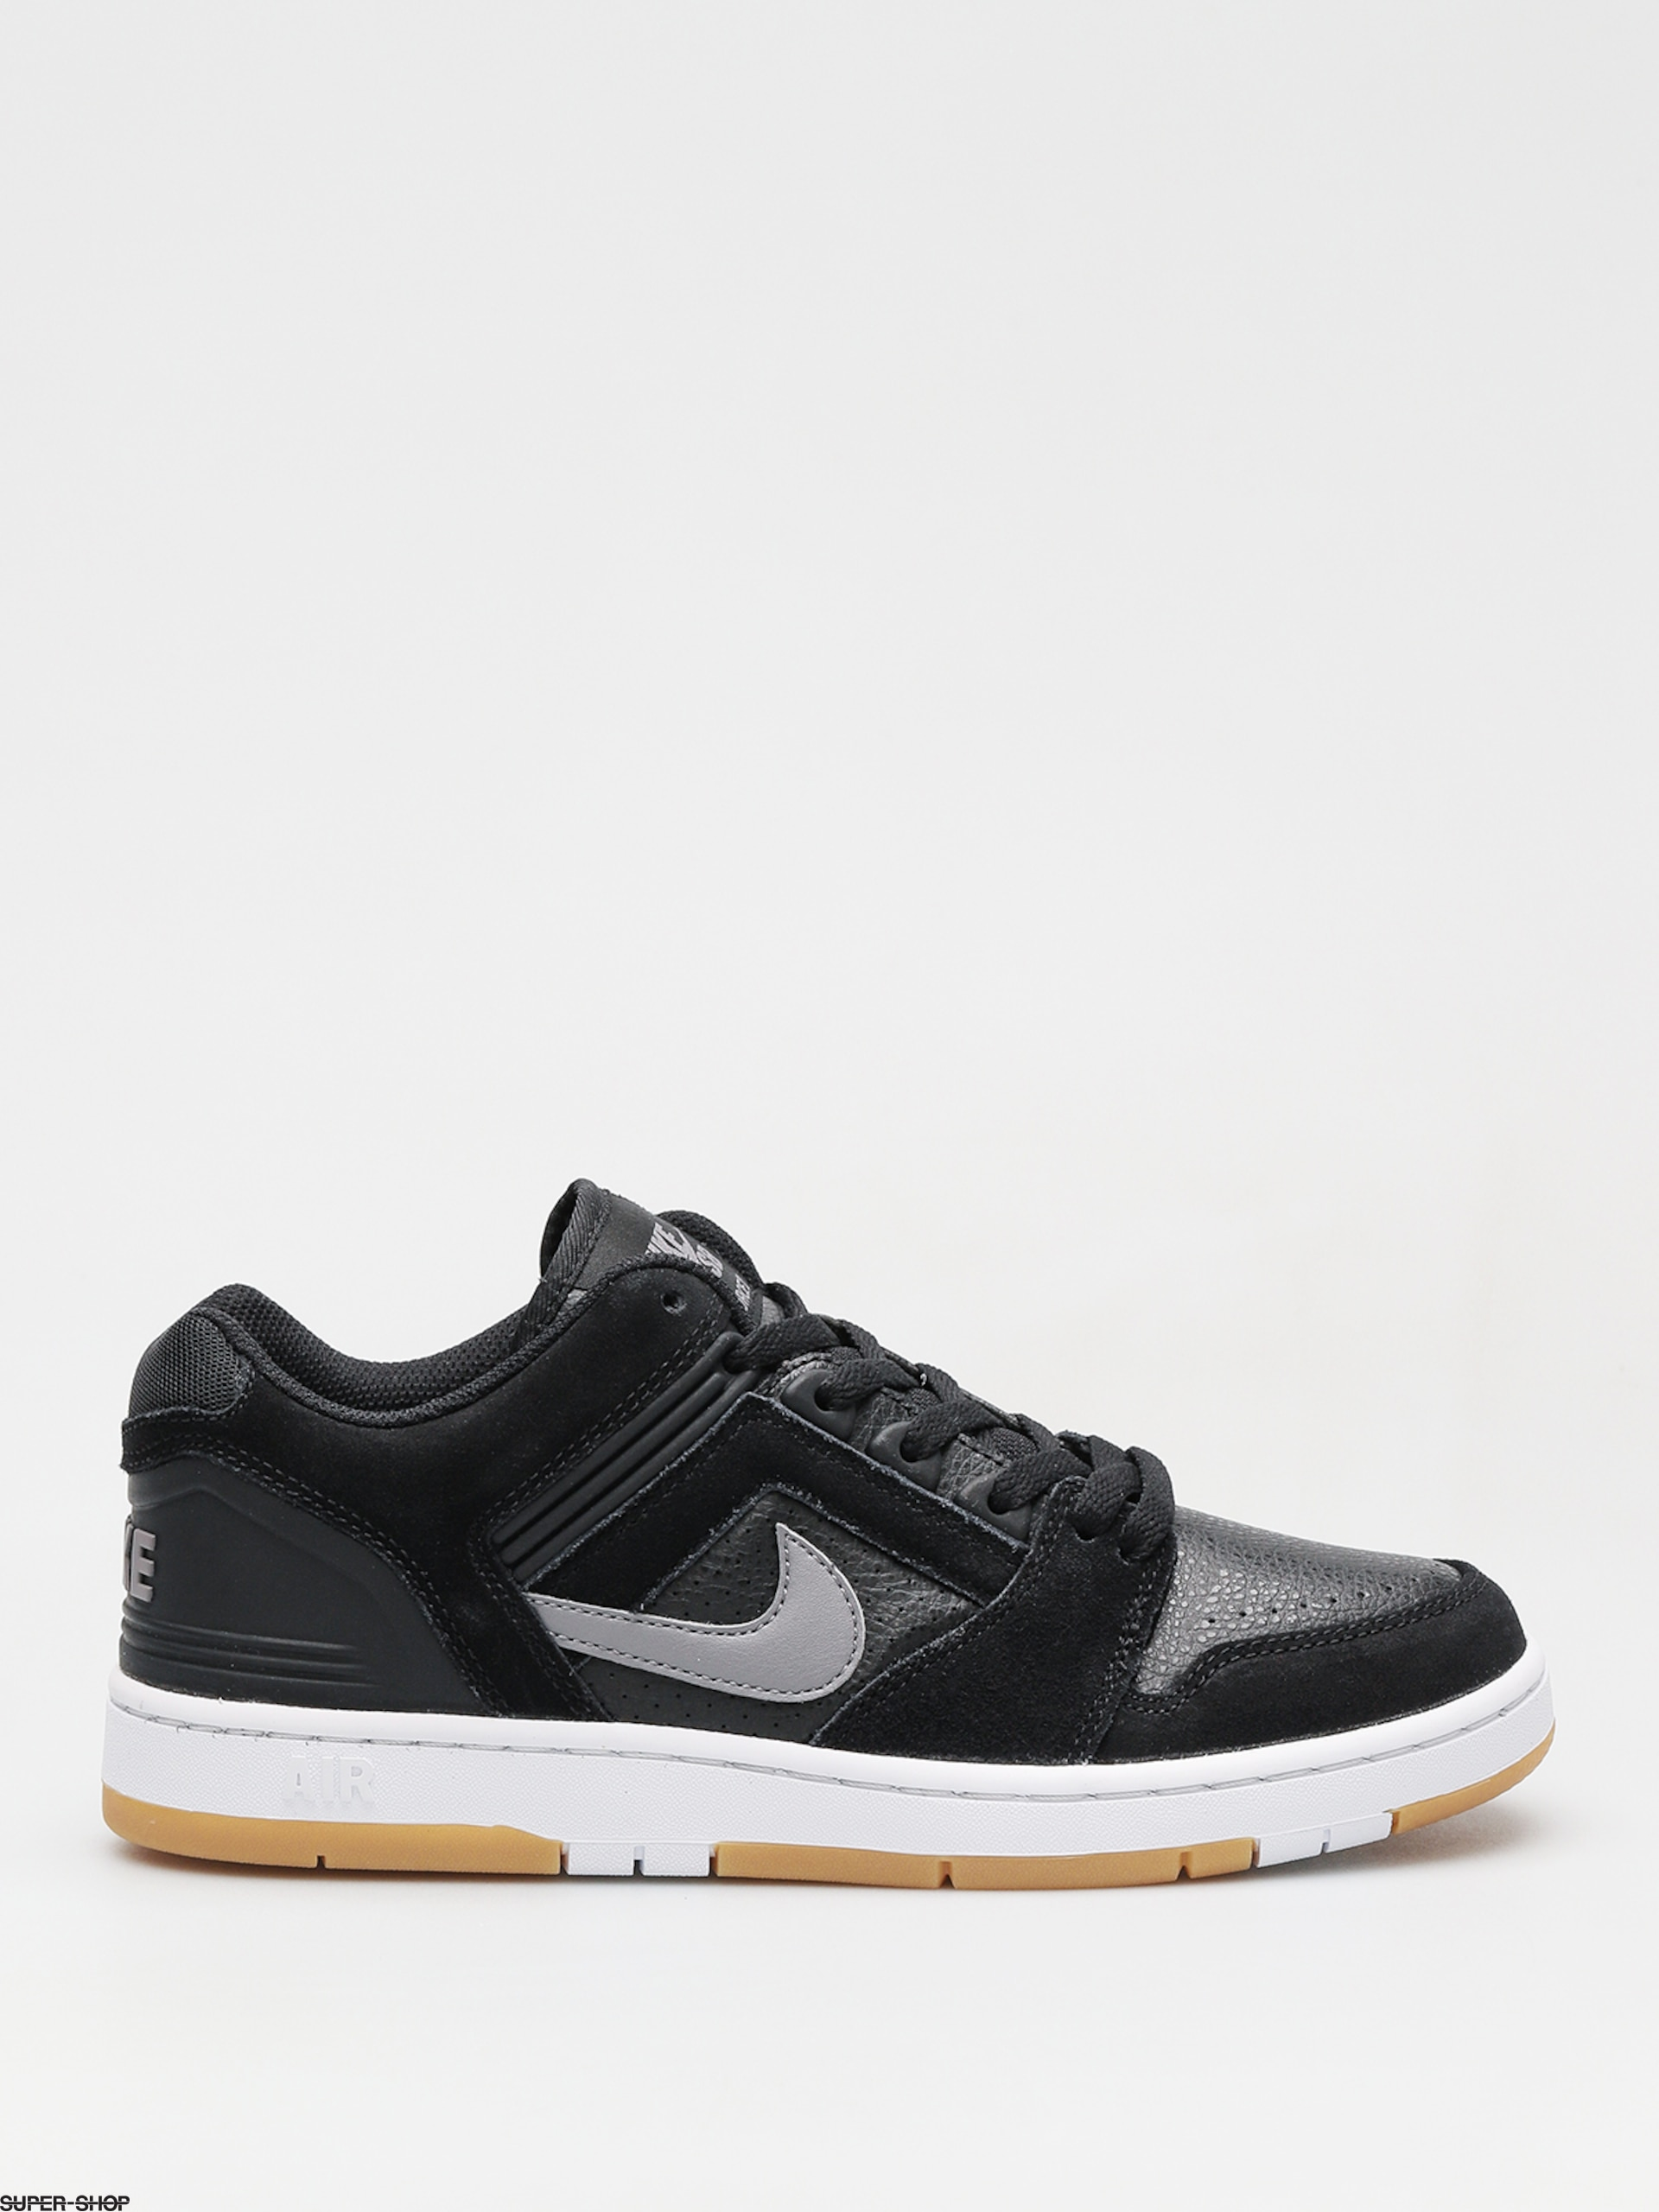 db8149ee4da90 Nike SB Sb Air Force II Low Shoes (black gunsmoke white gum light brown)